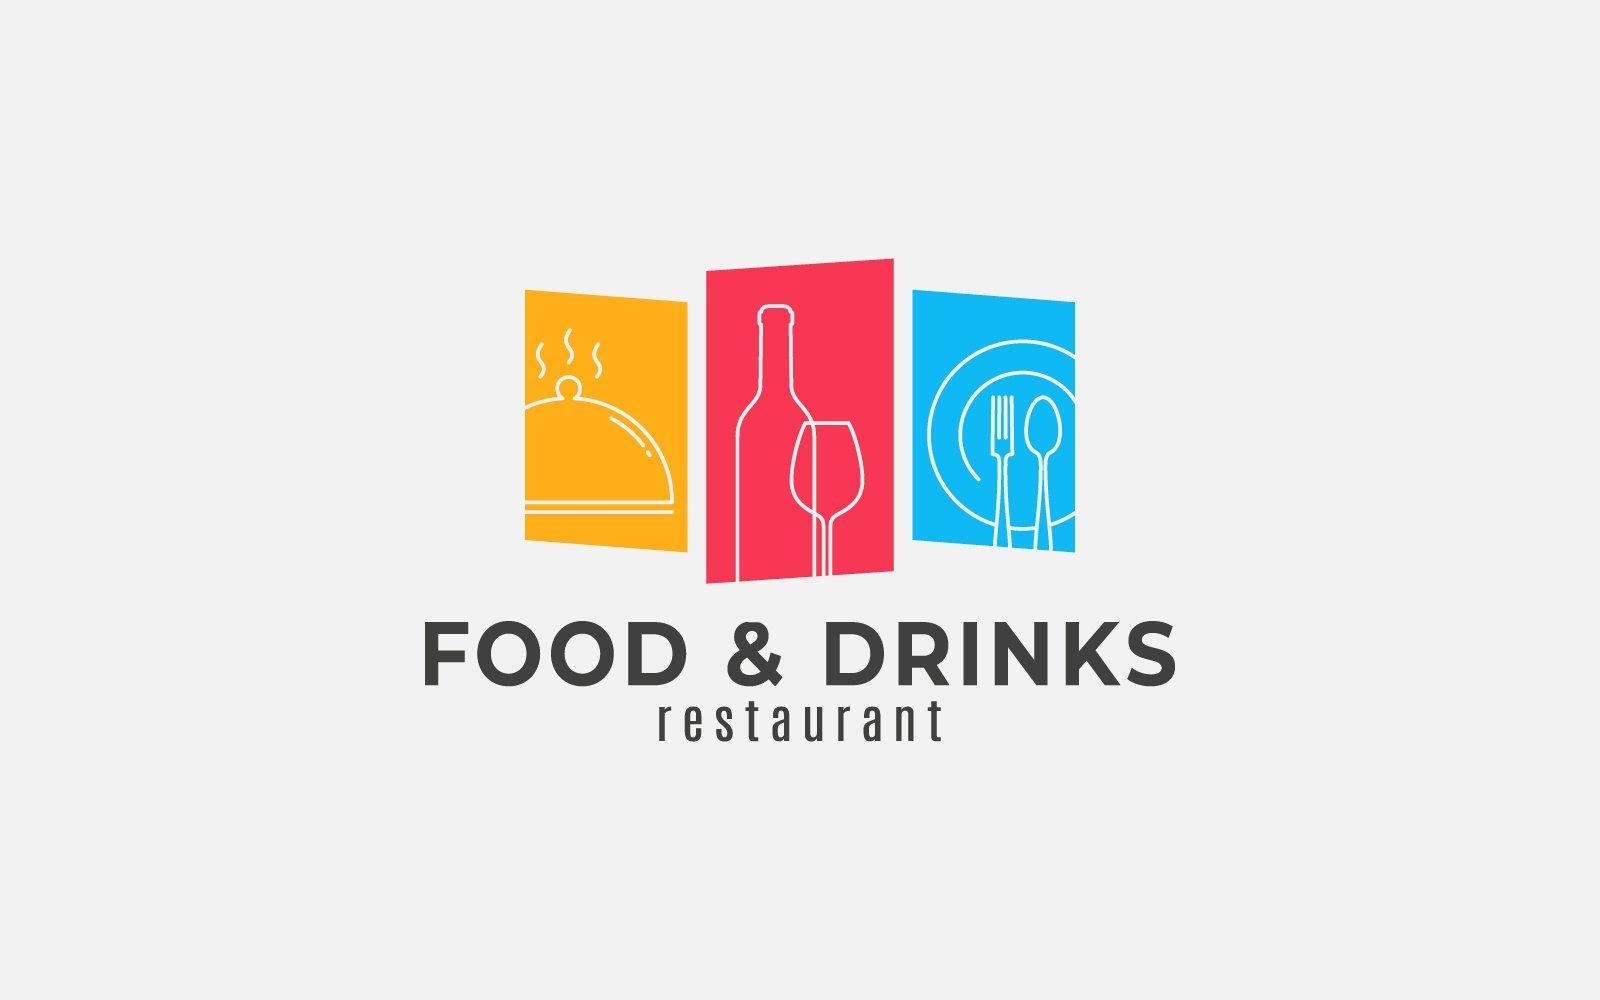 Food and Drinks Unika logotyp mall #124225